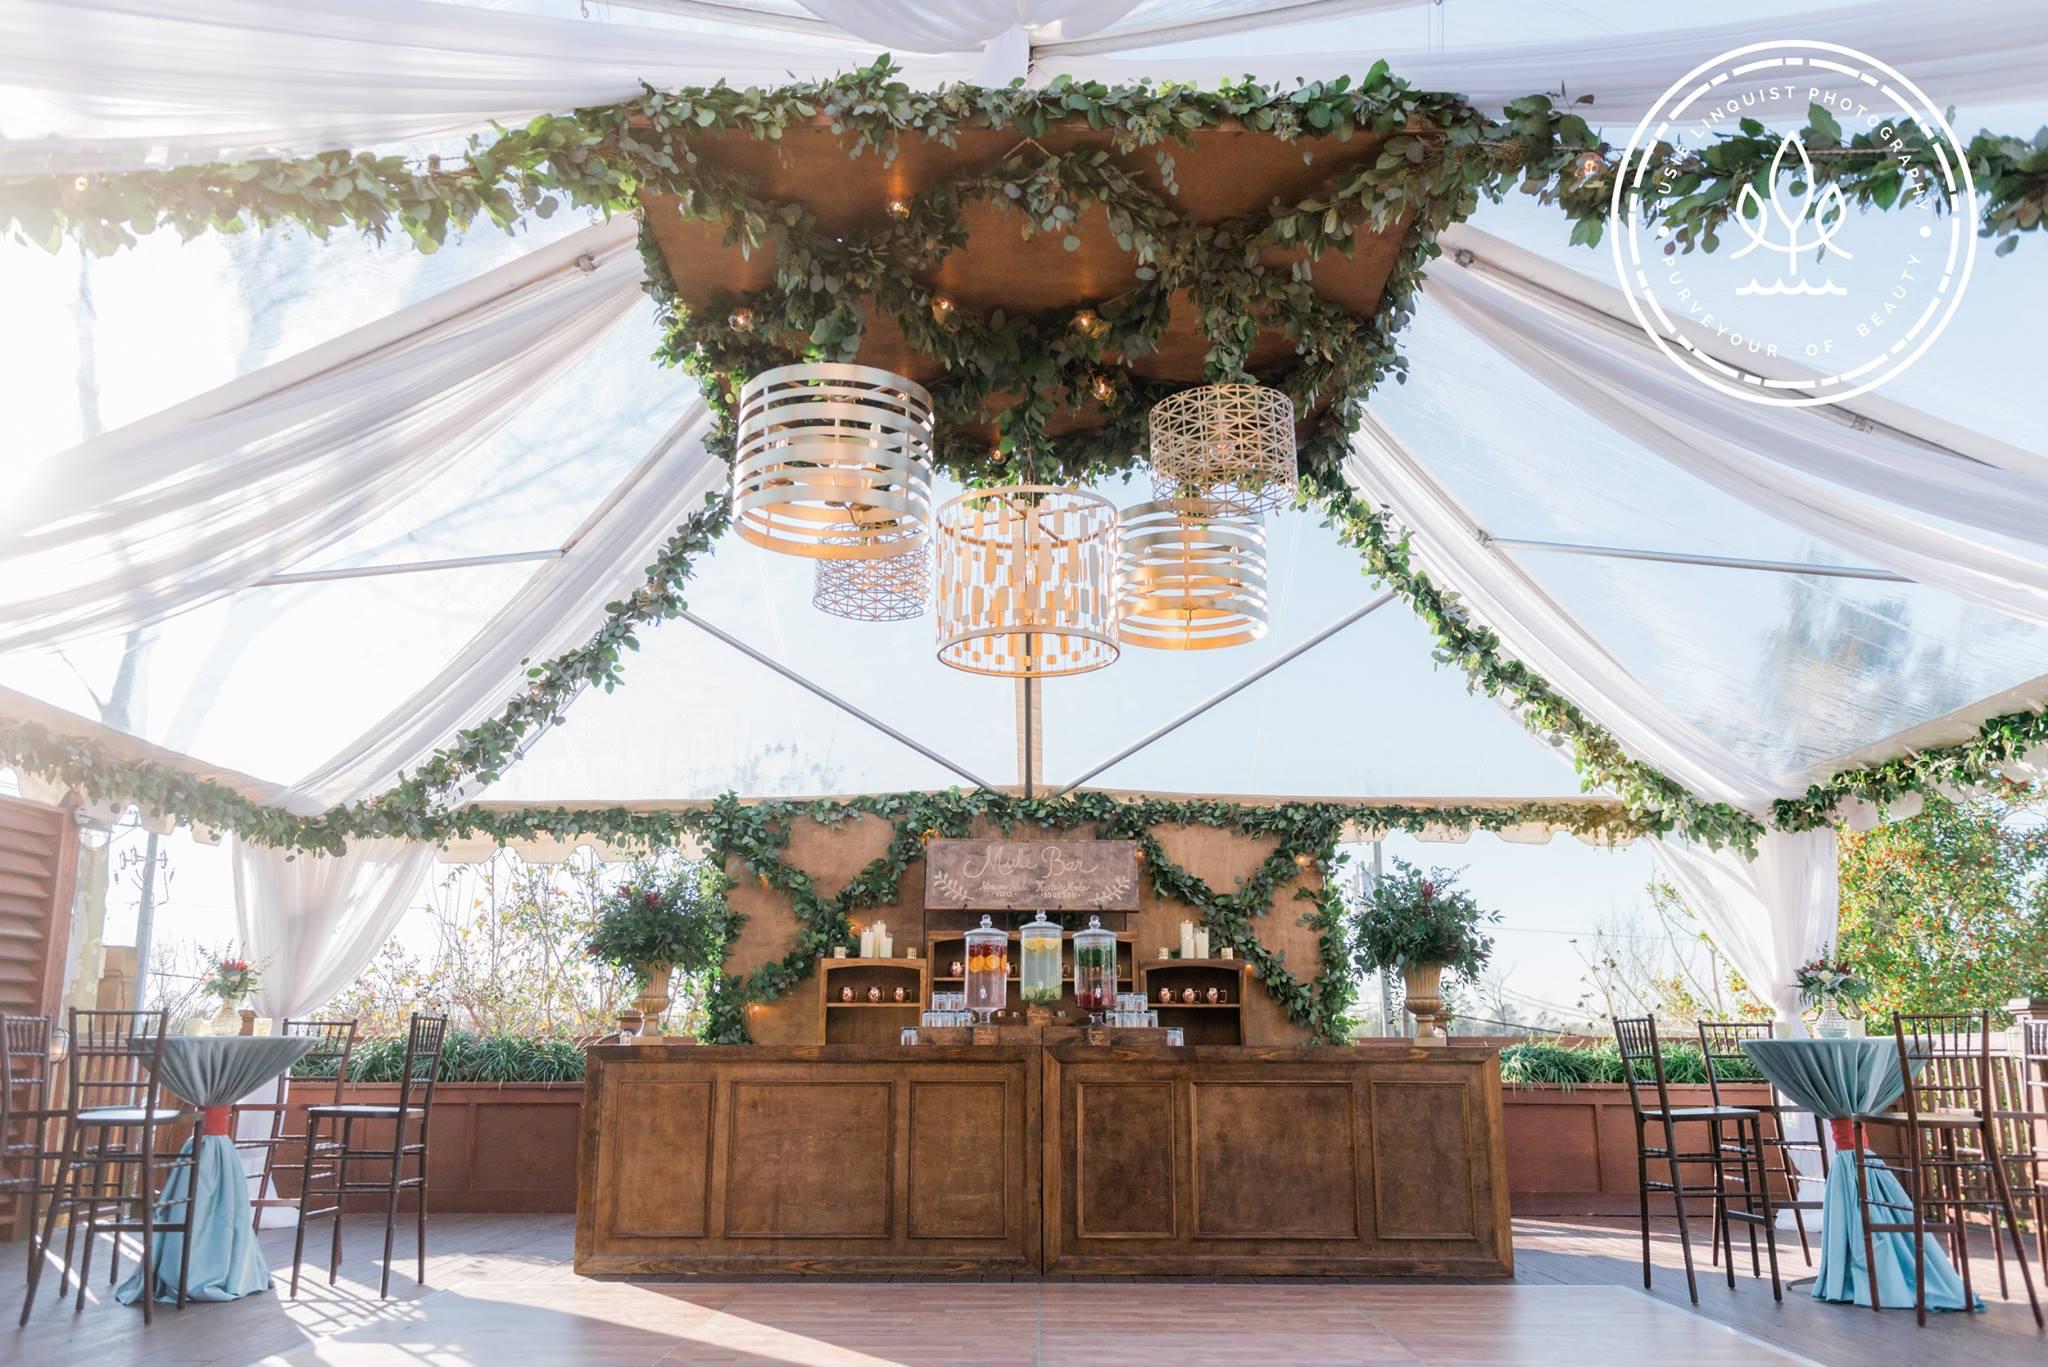 128South CourtyardsandCobblestones Bridal Inspiration 2016 (1).jpg